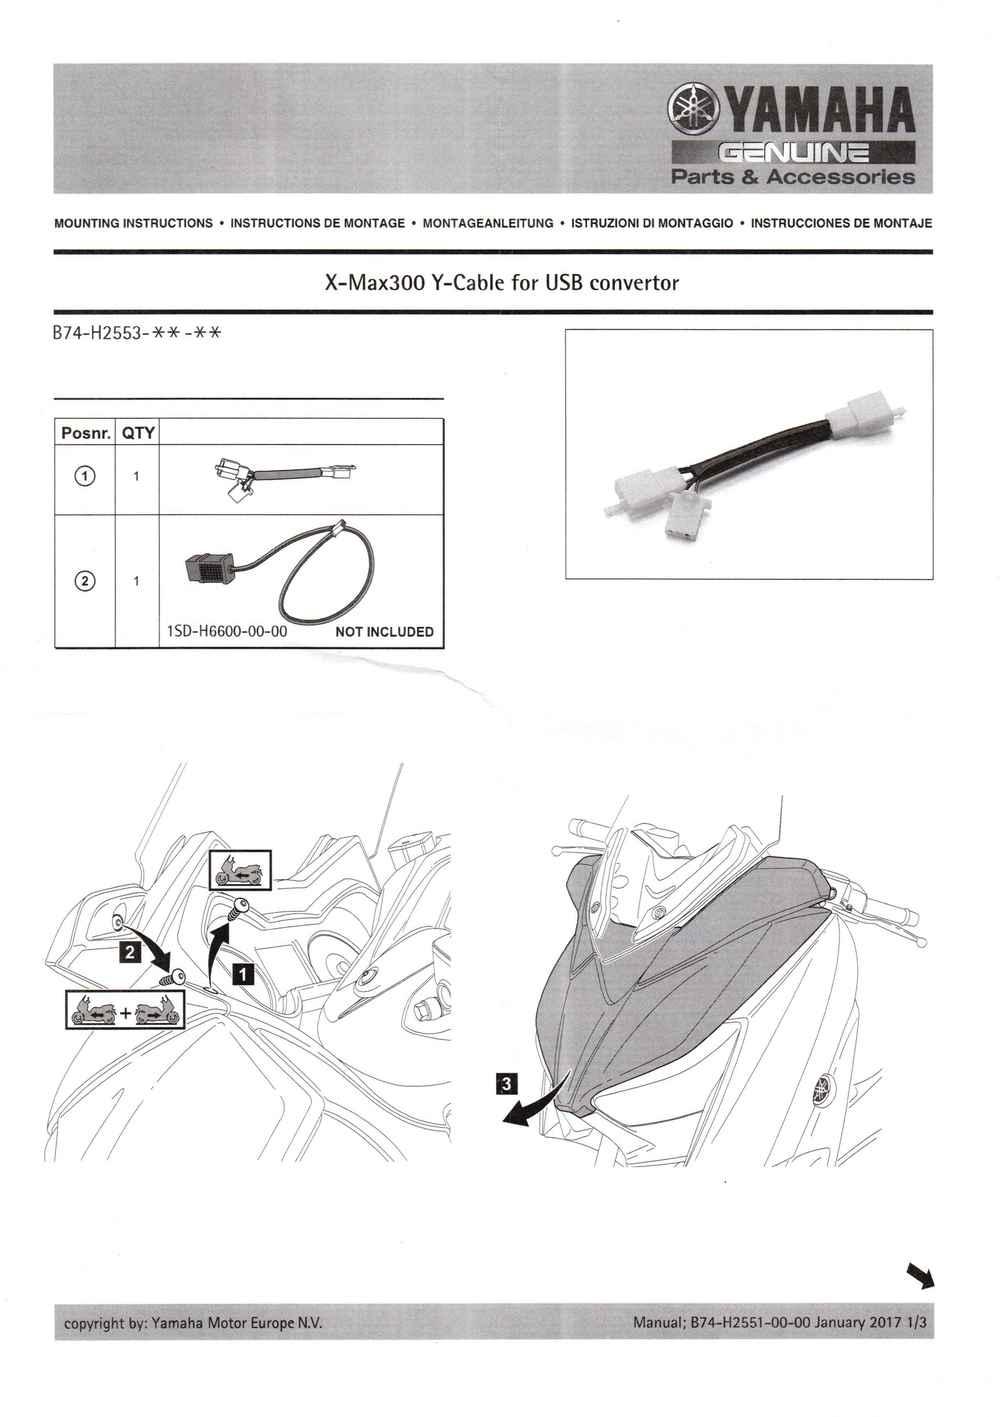 Montageanleitung Y-Kabel